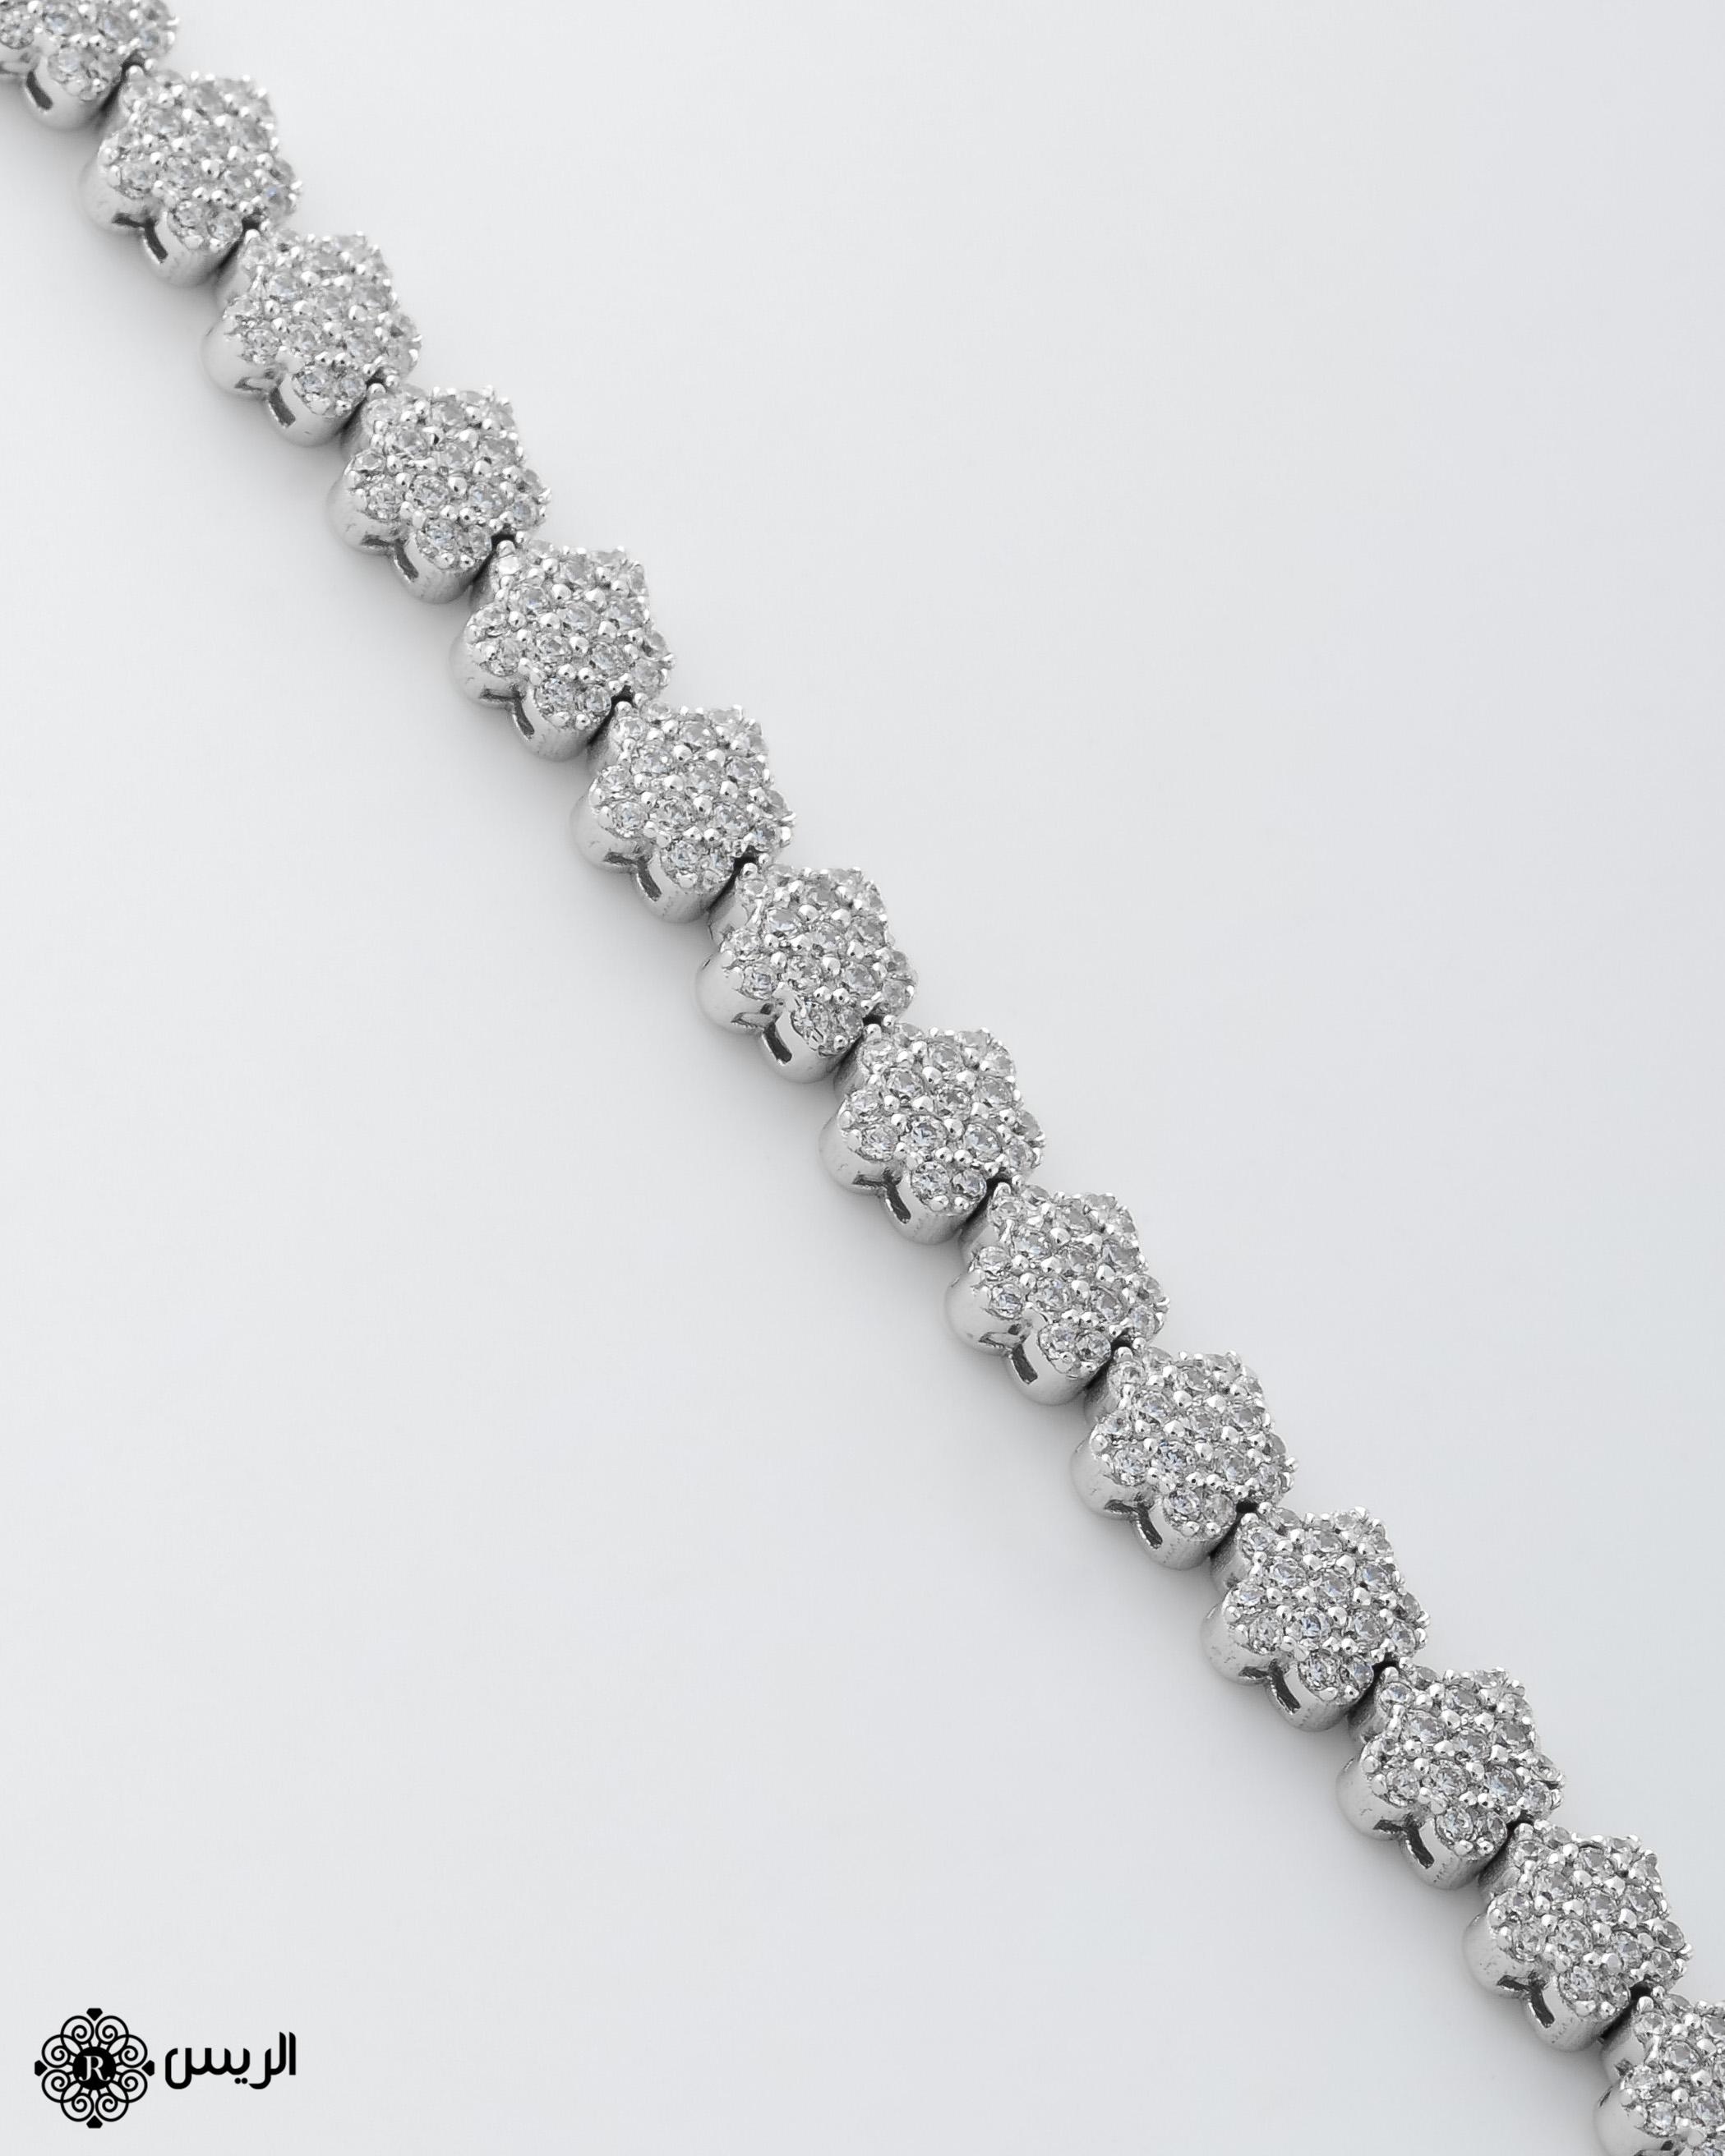 Raies jewelry Bracelet Classic Design إسورة (إنسيالة) تصميم كلاسيك الريس للمجوهرات